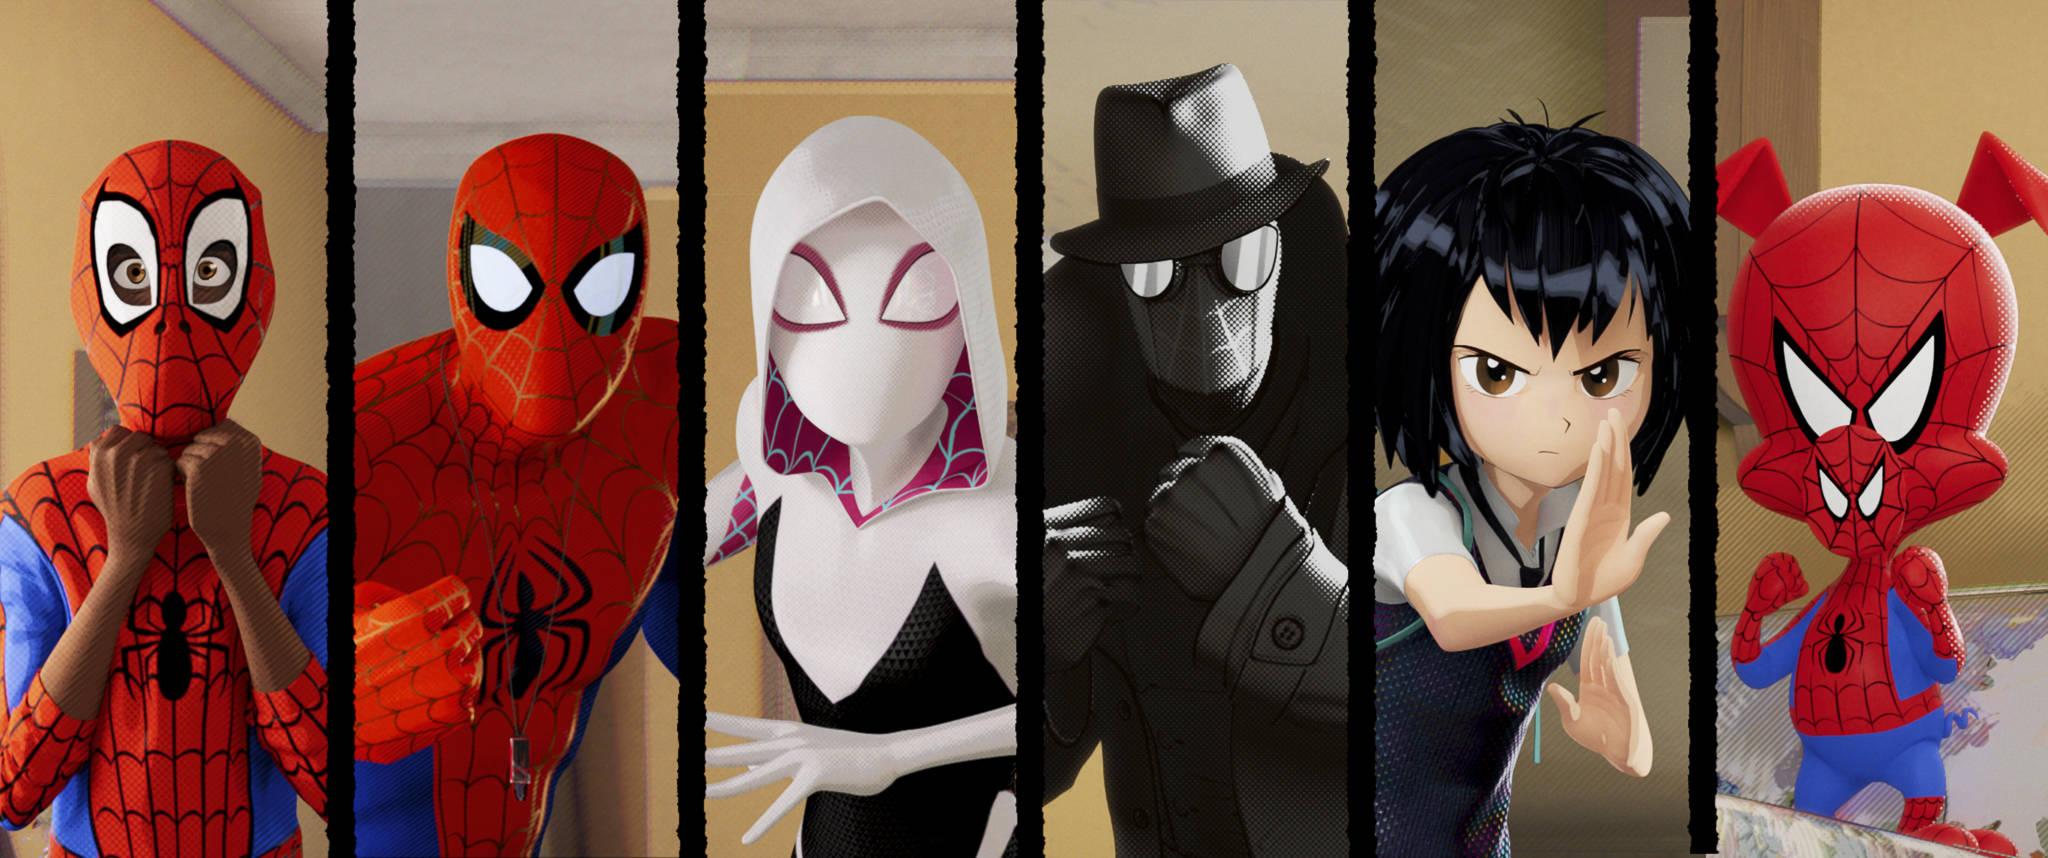 spiderverse cast